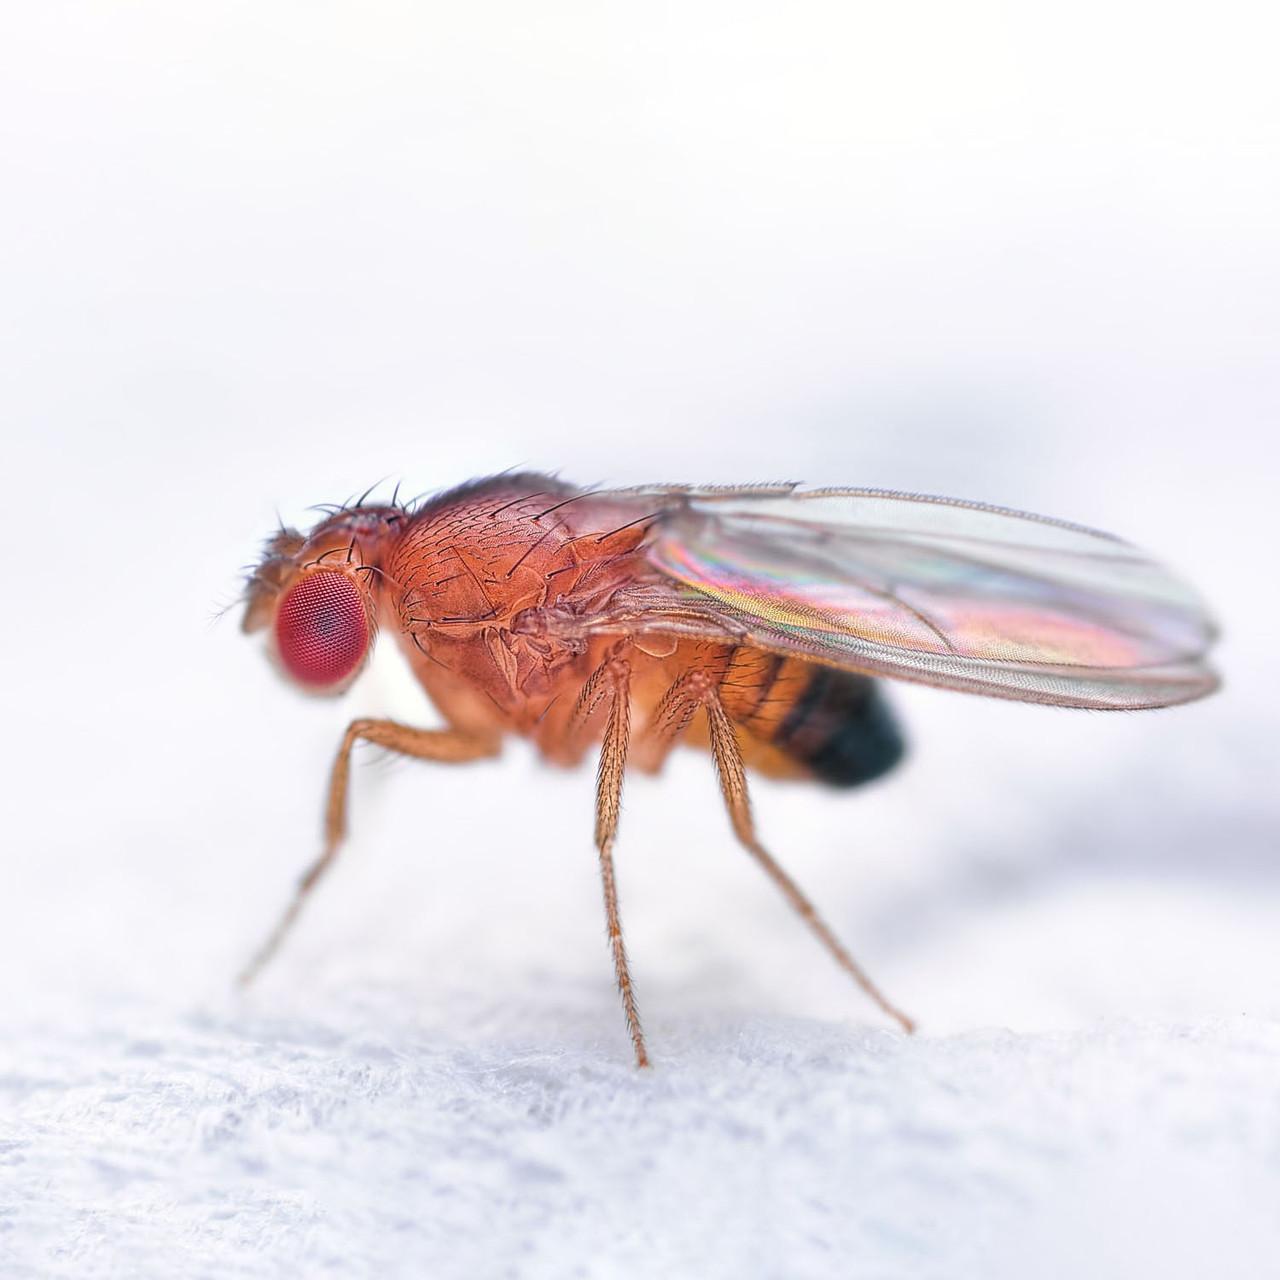 Drosophila, white eye, live